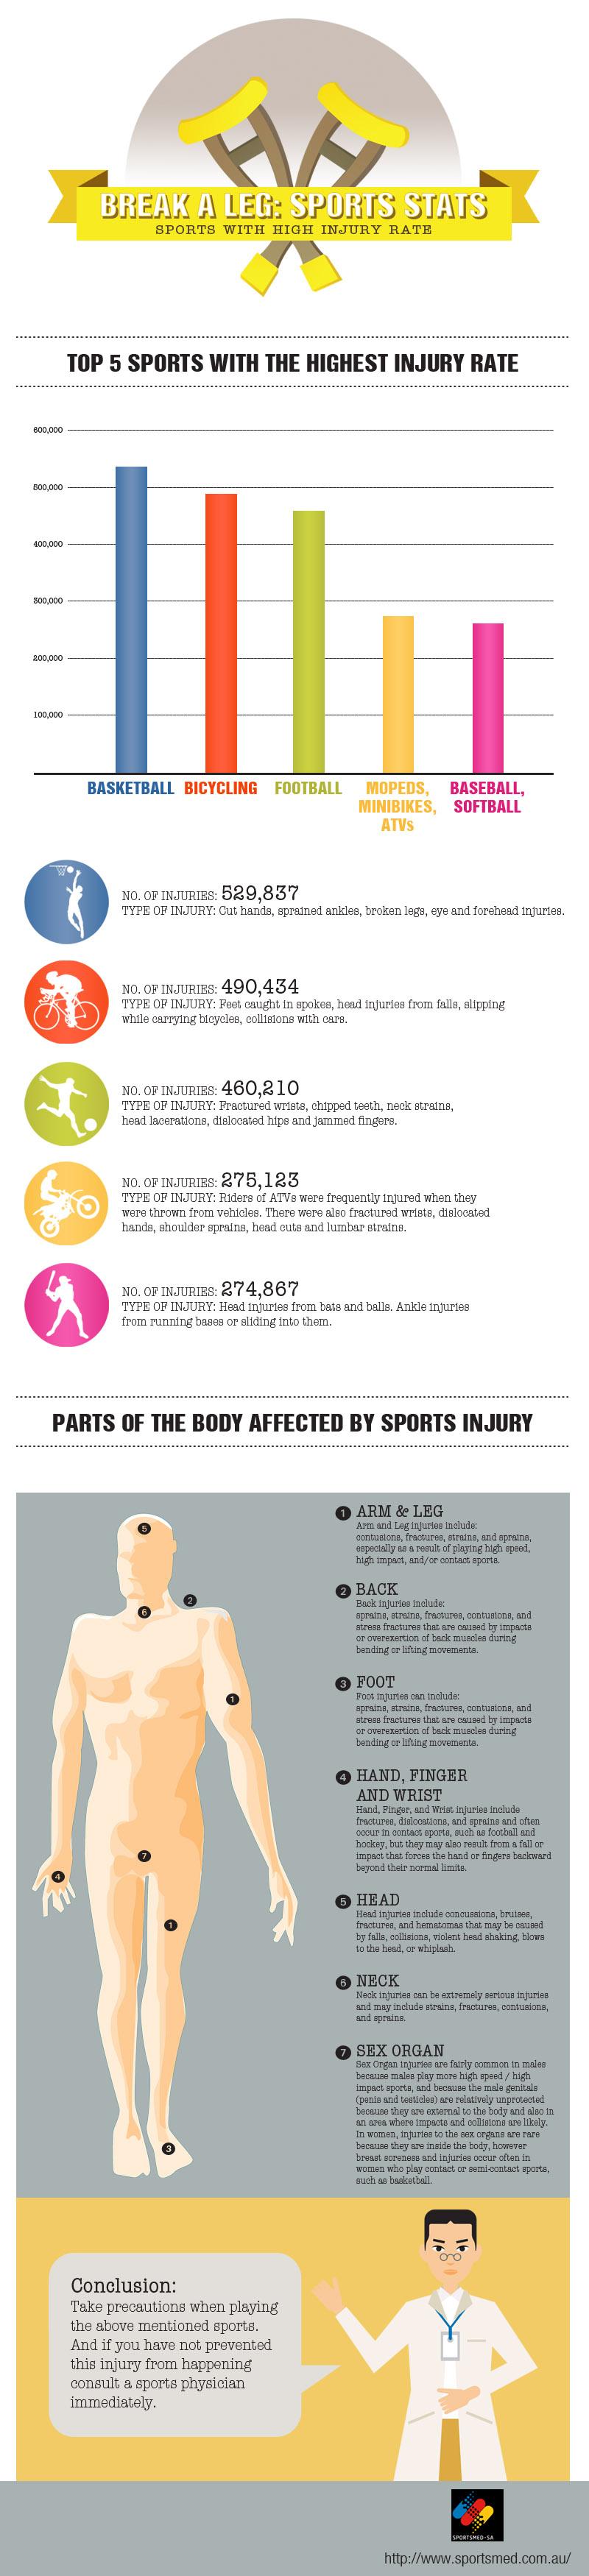 Break a Leg - Sports Stats, Sport, Infographic, Injury, HQ Photo